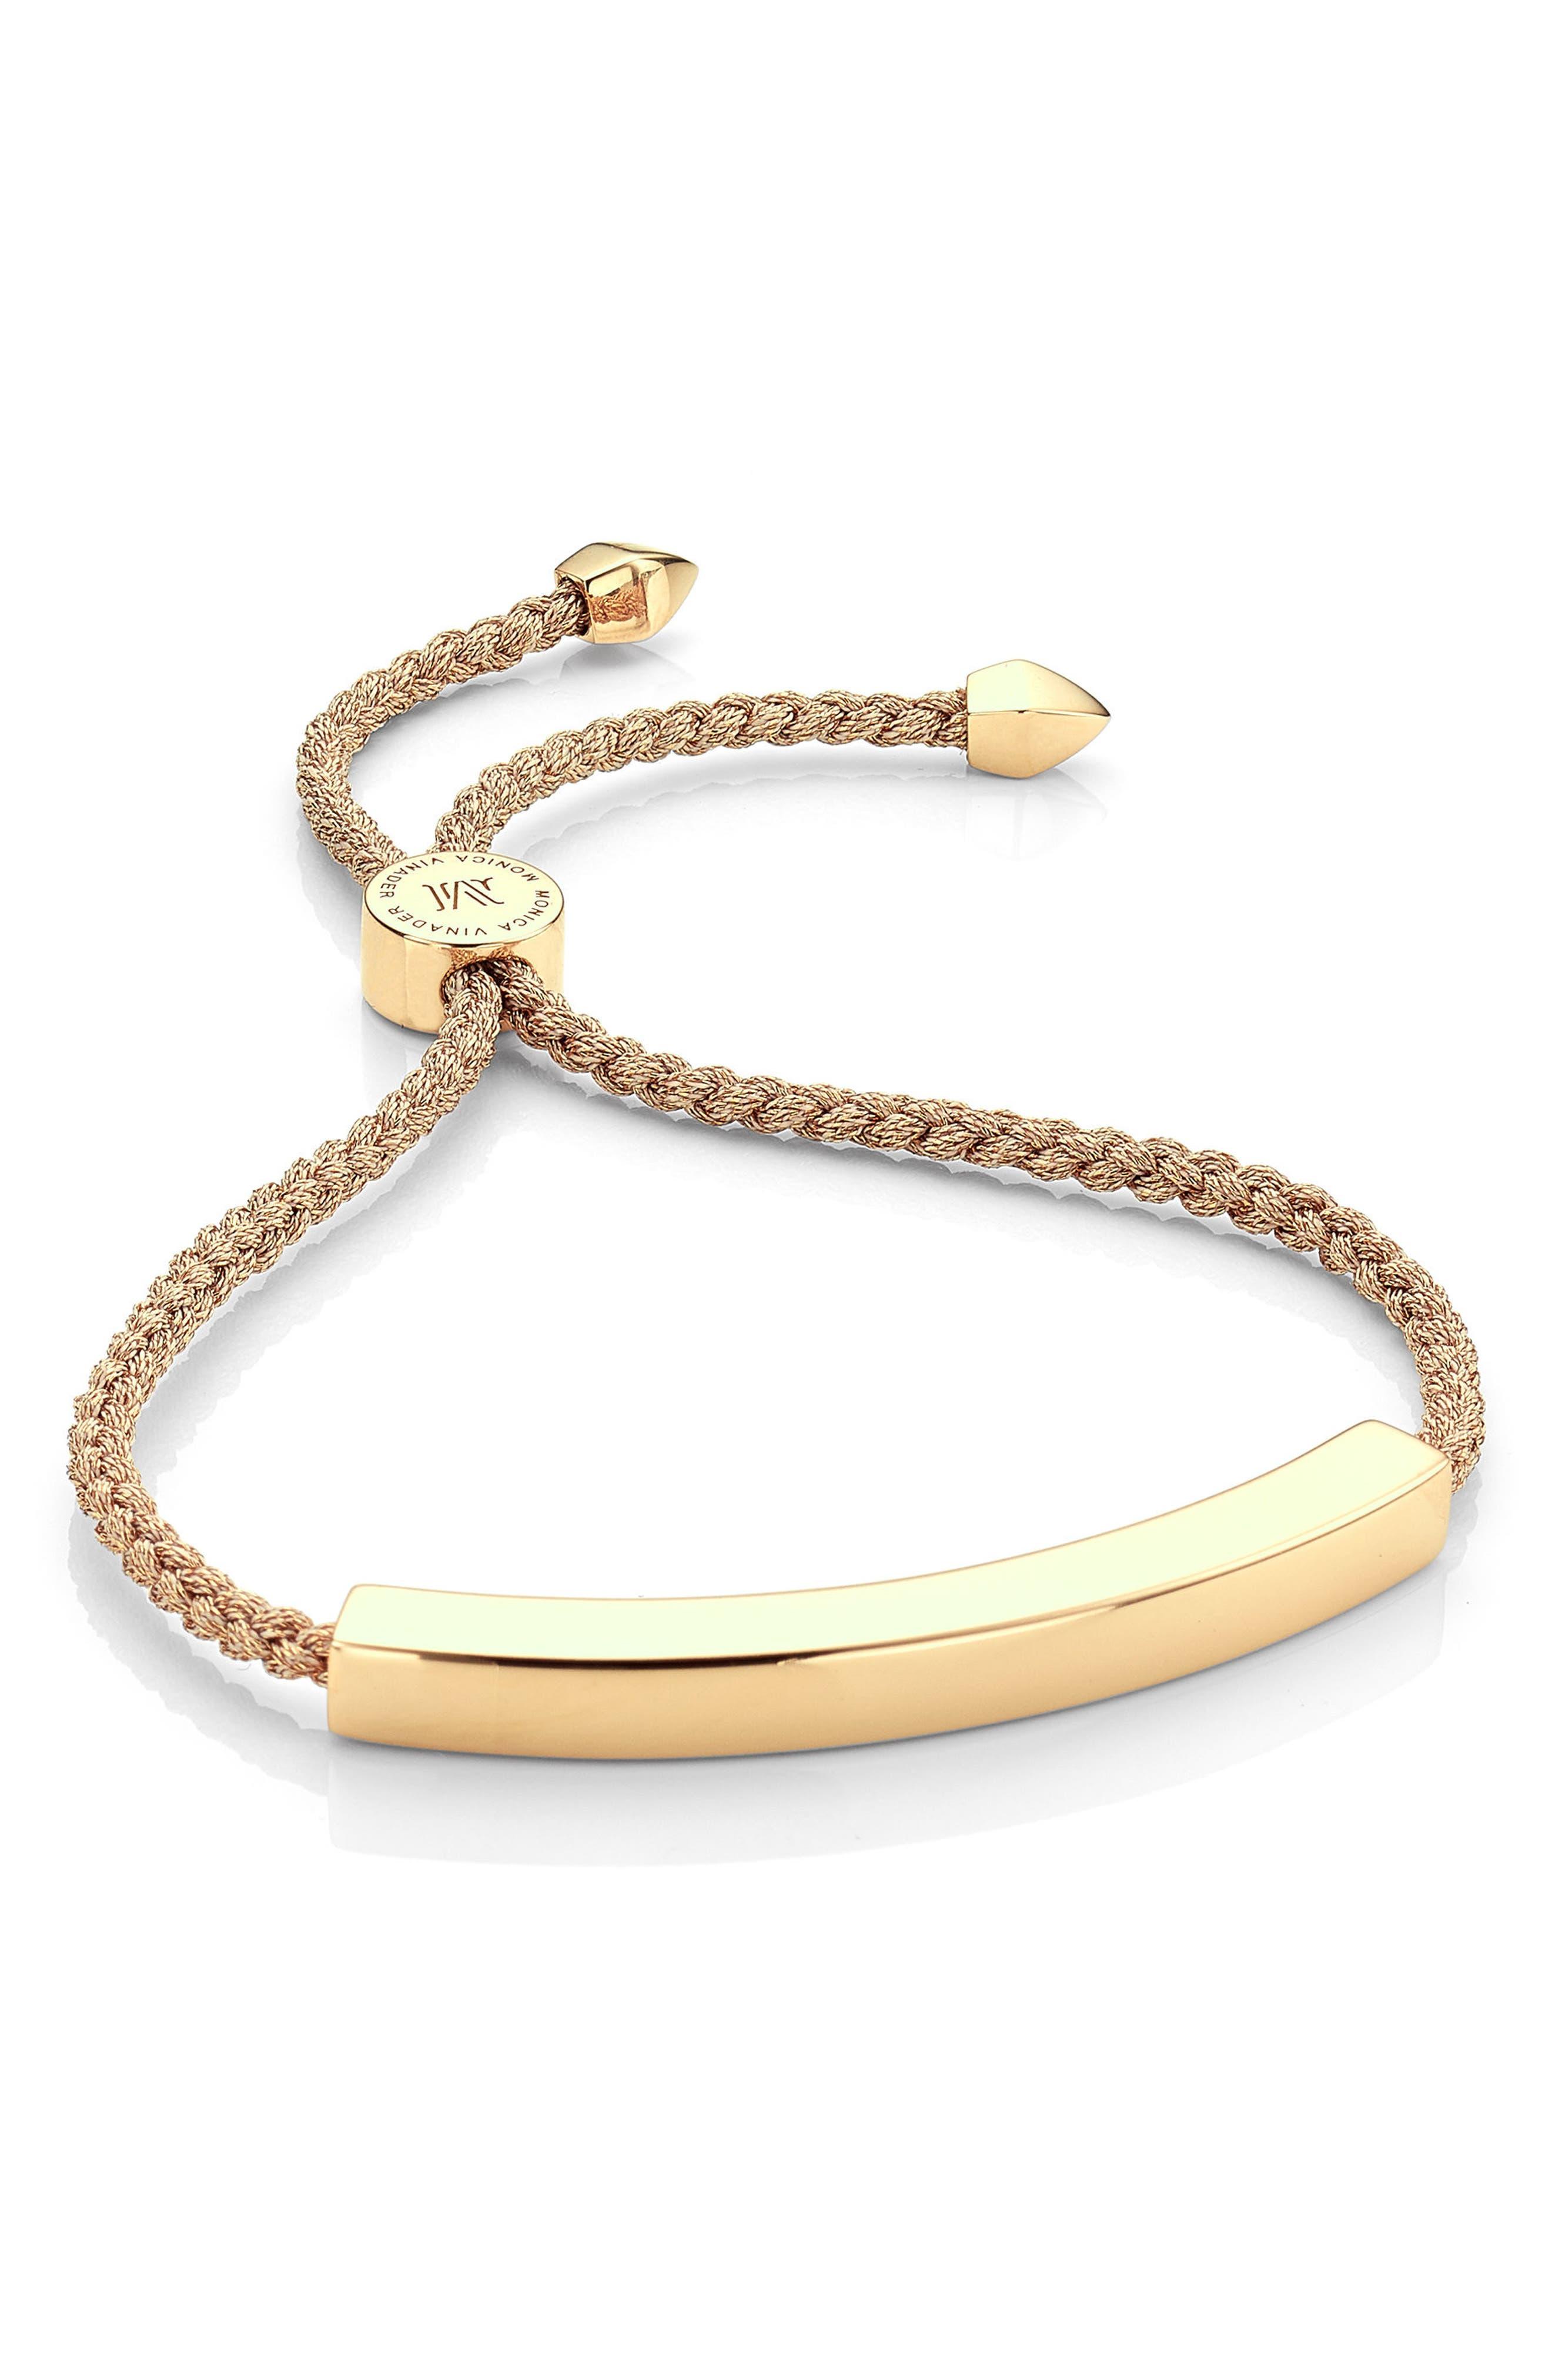 MONICA VINADER Linear Friendship Bracelet